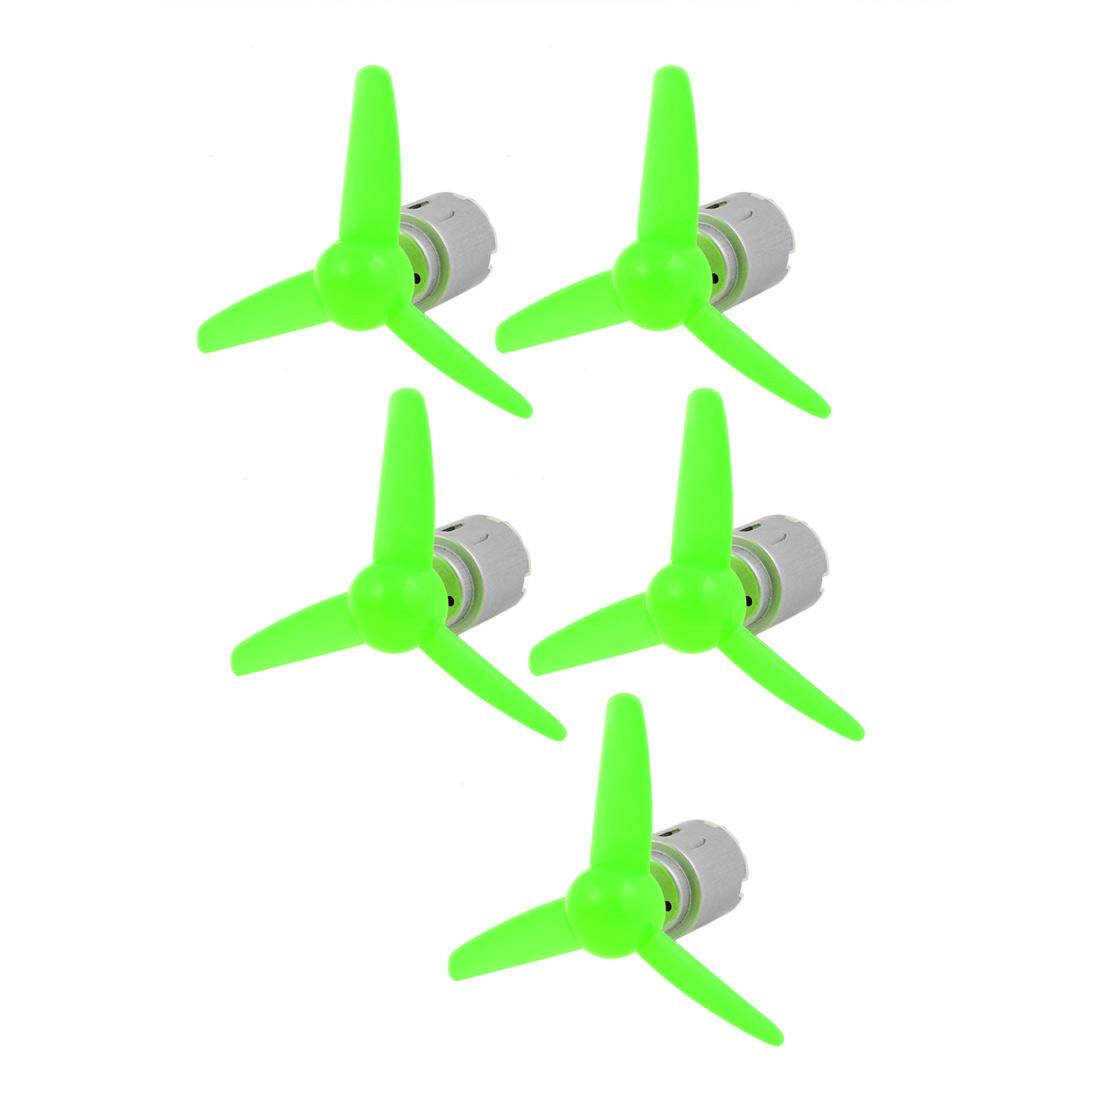 5 Pcs DC 6.0V 0.13A 5000RPM Motor 80mm 3-Vanes Pointed Propeller Green - image 6 de 6